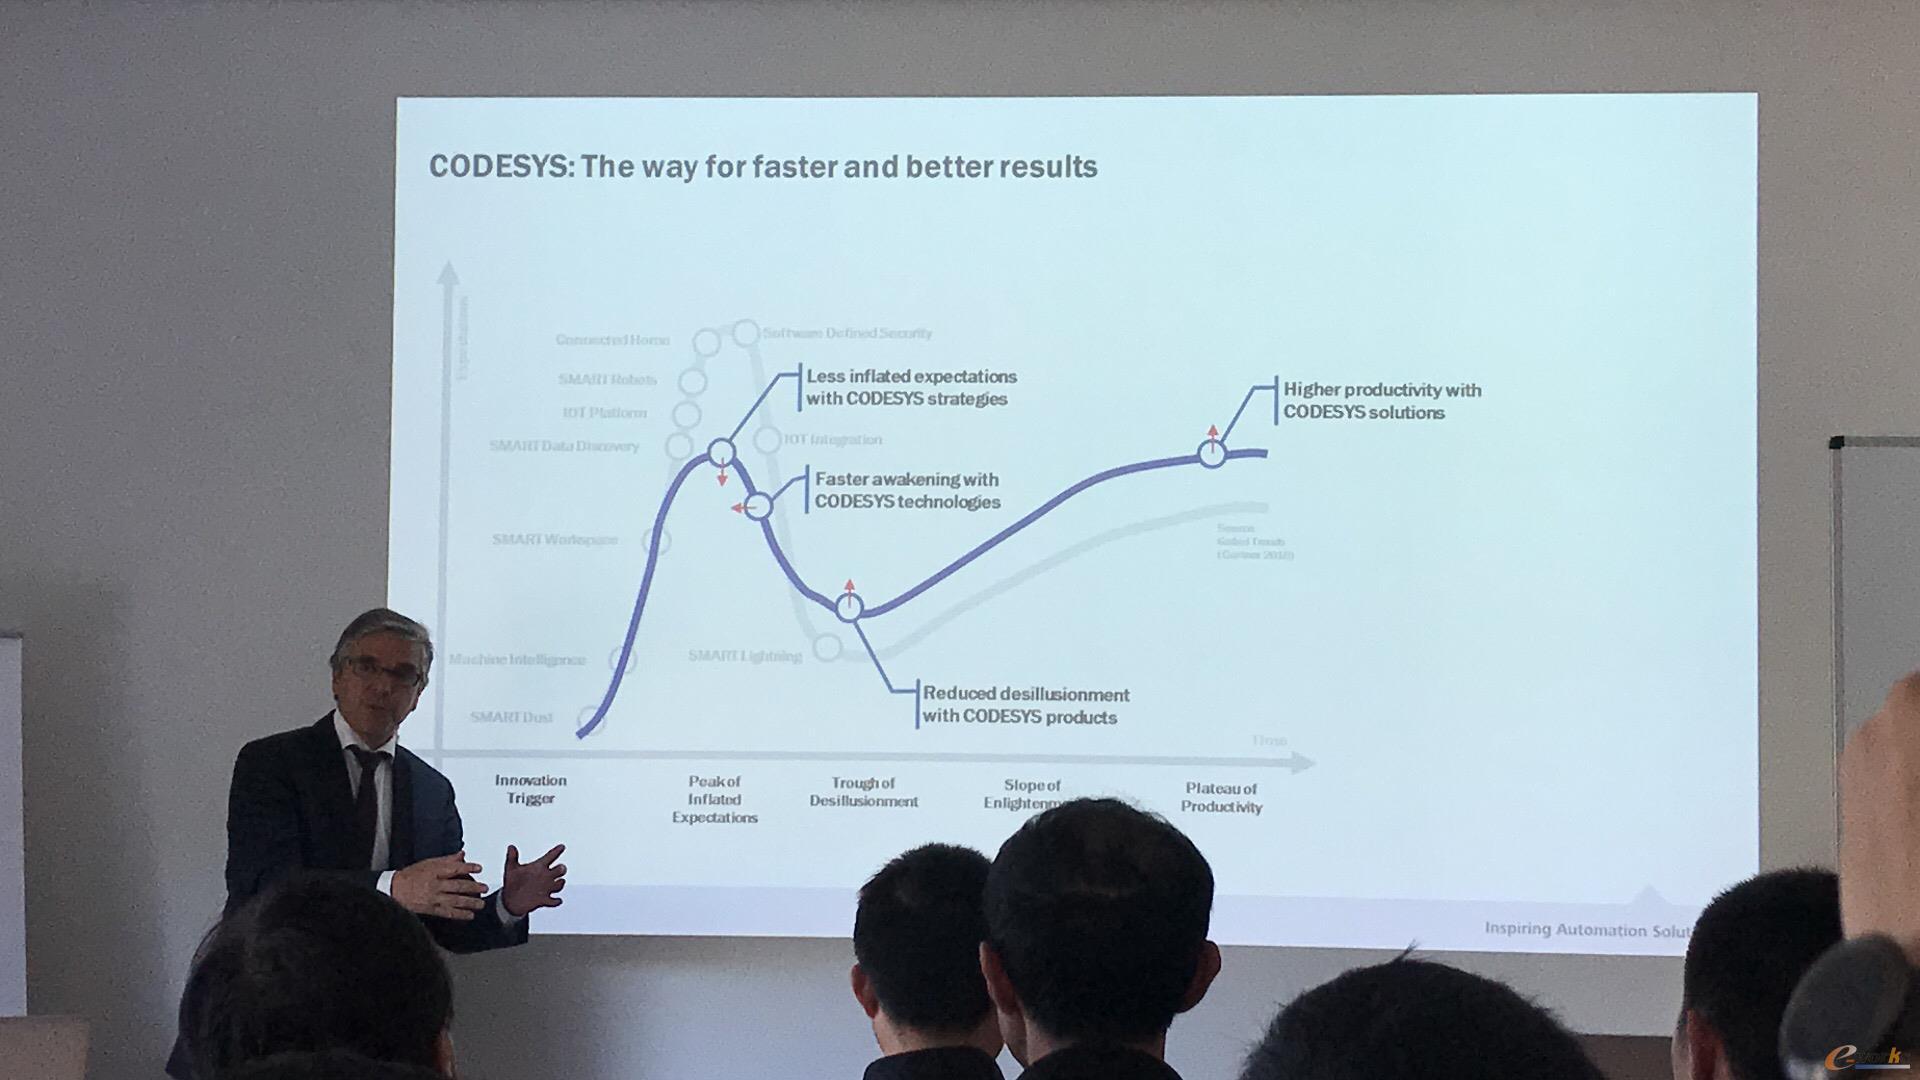 3S公司CEO Manfred先生介绍工业4.0技术发展